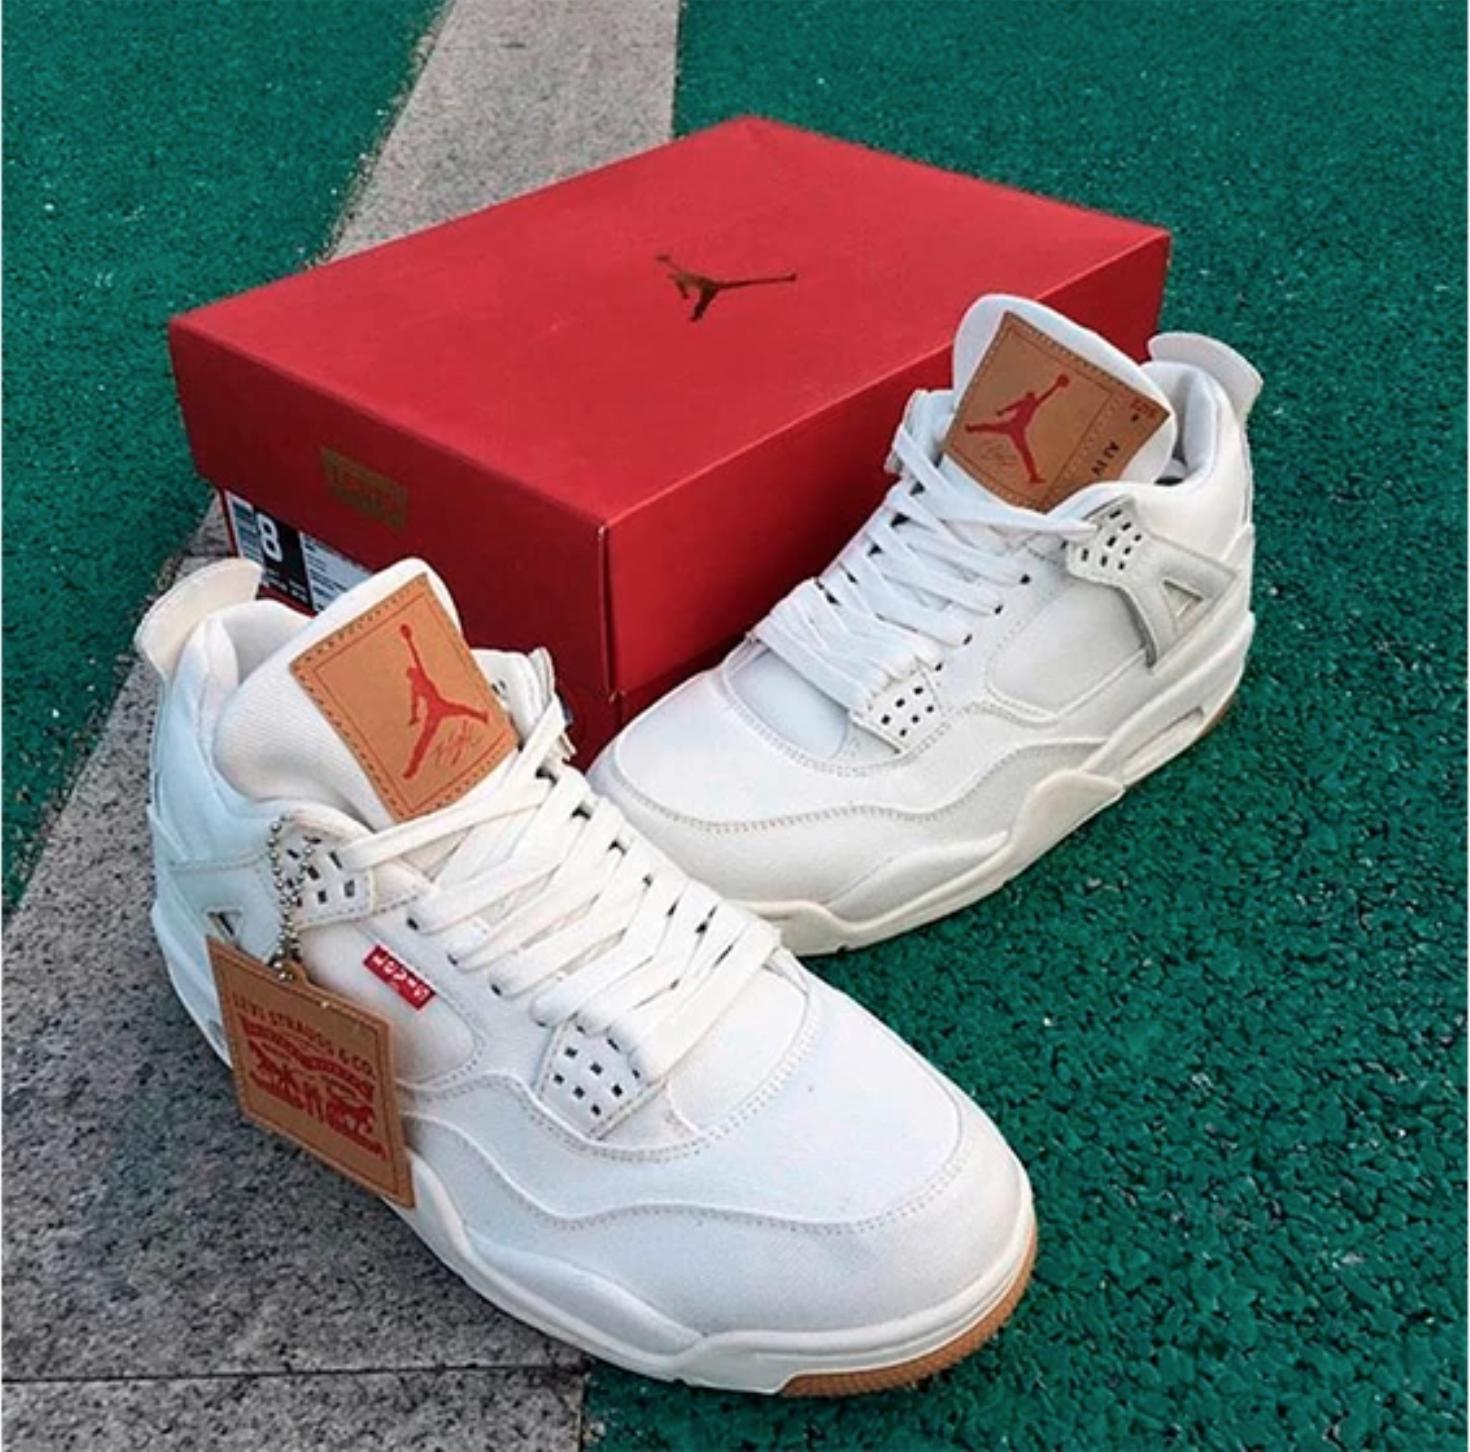 Excepcional datos colgante  Levi's x Air Jordan 4 white denim | Air jordans, Latest sneakers, Sneakers